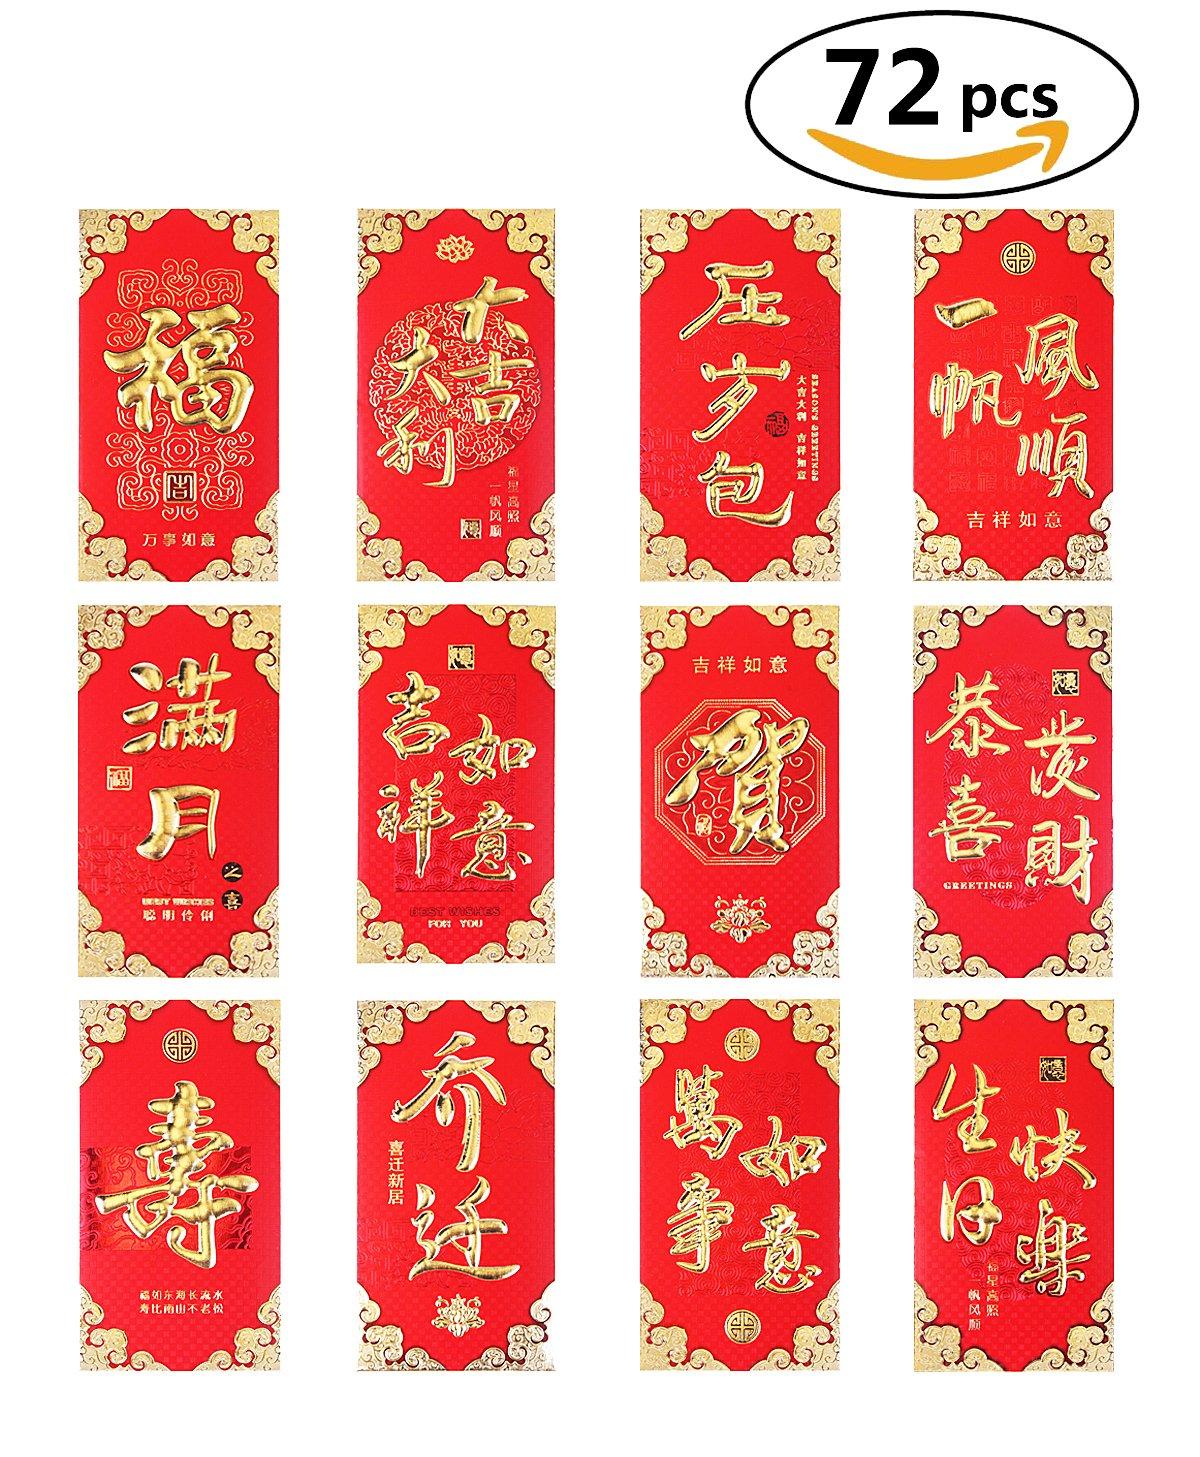 ELLZK Chinese Envelopes Chinese Red Envelopes Lucky Money Envelopes (12Patterns 72Pcs)